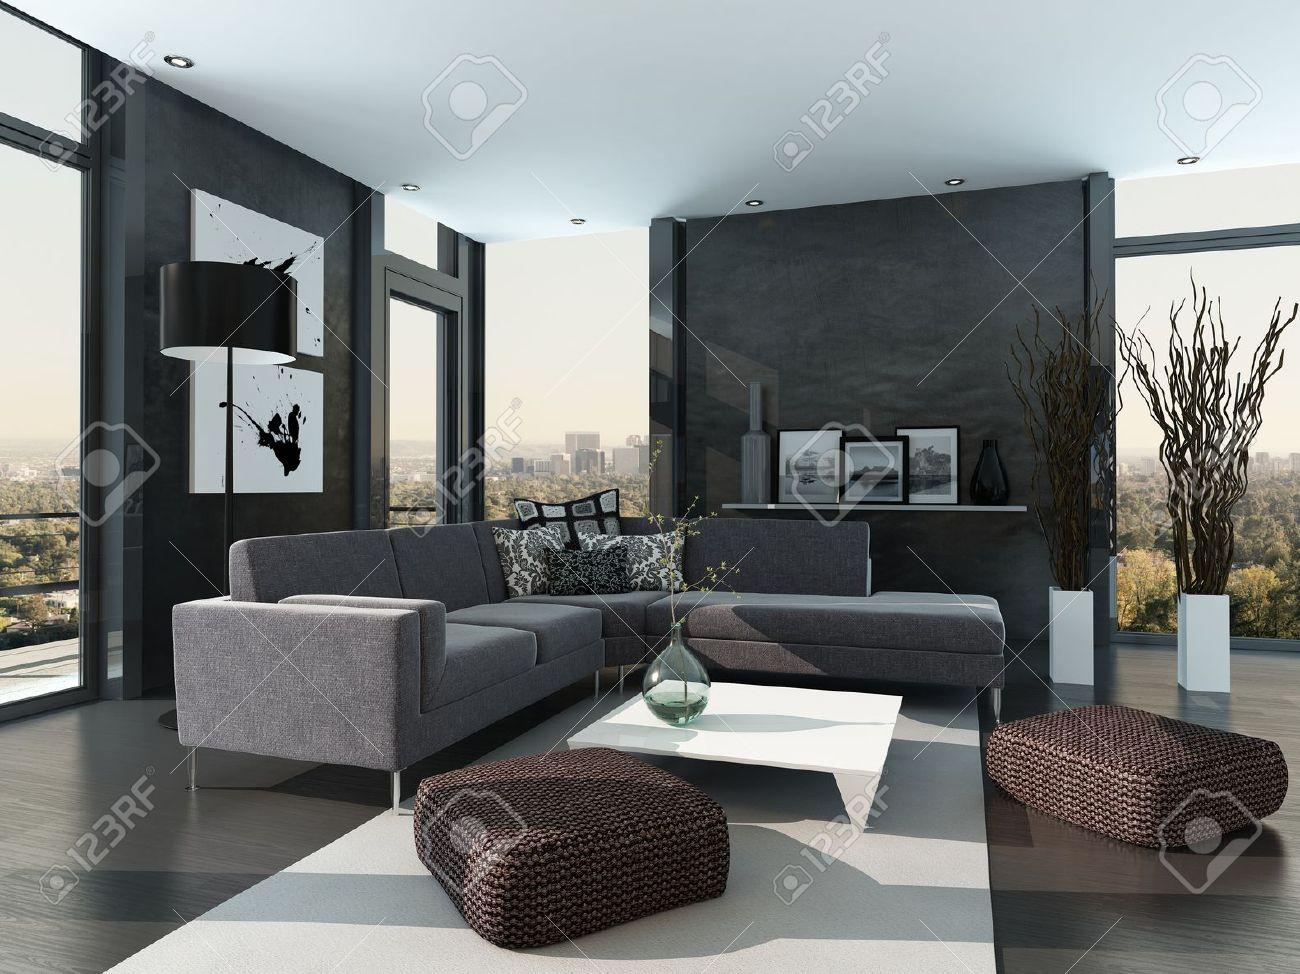 Modern Woonkamer Design – artsmedia.info